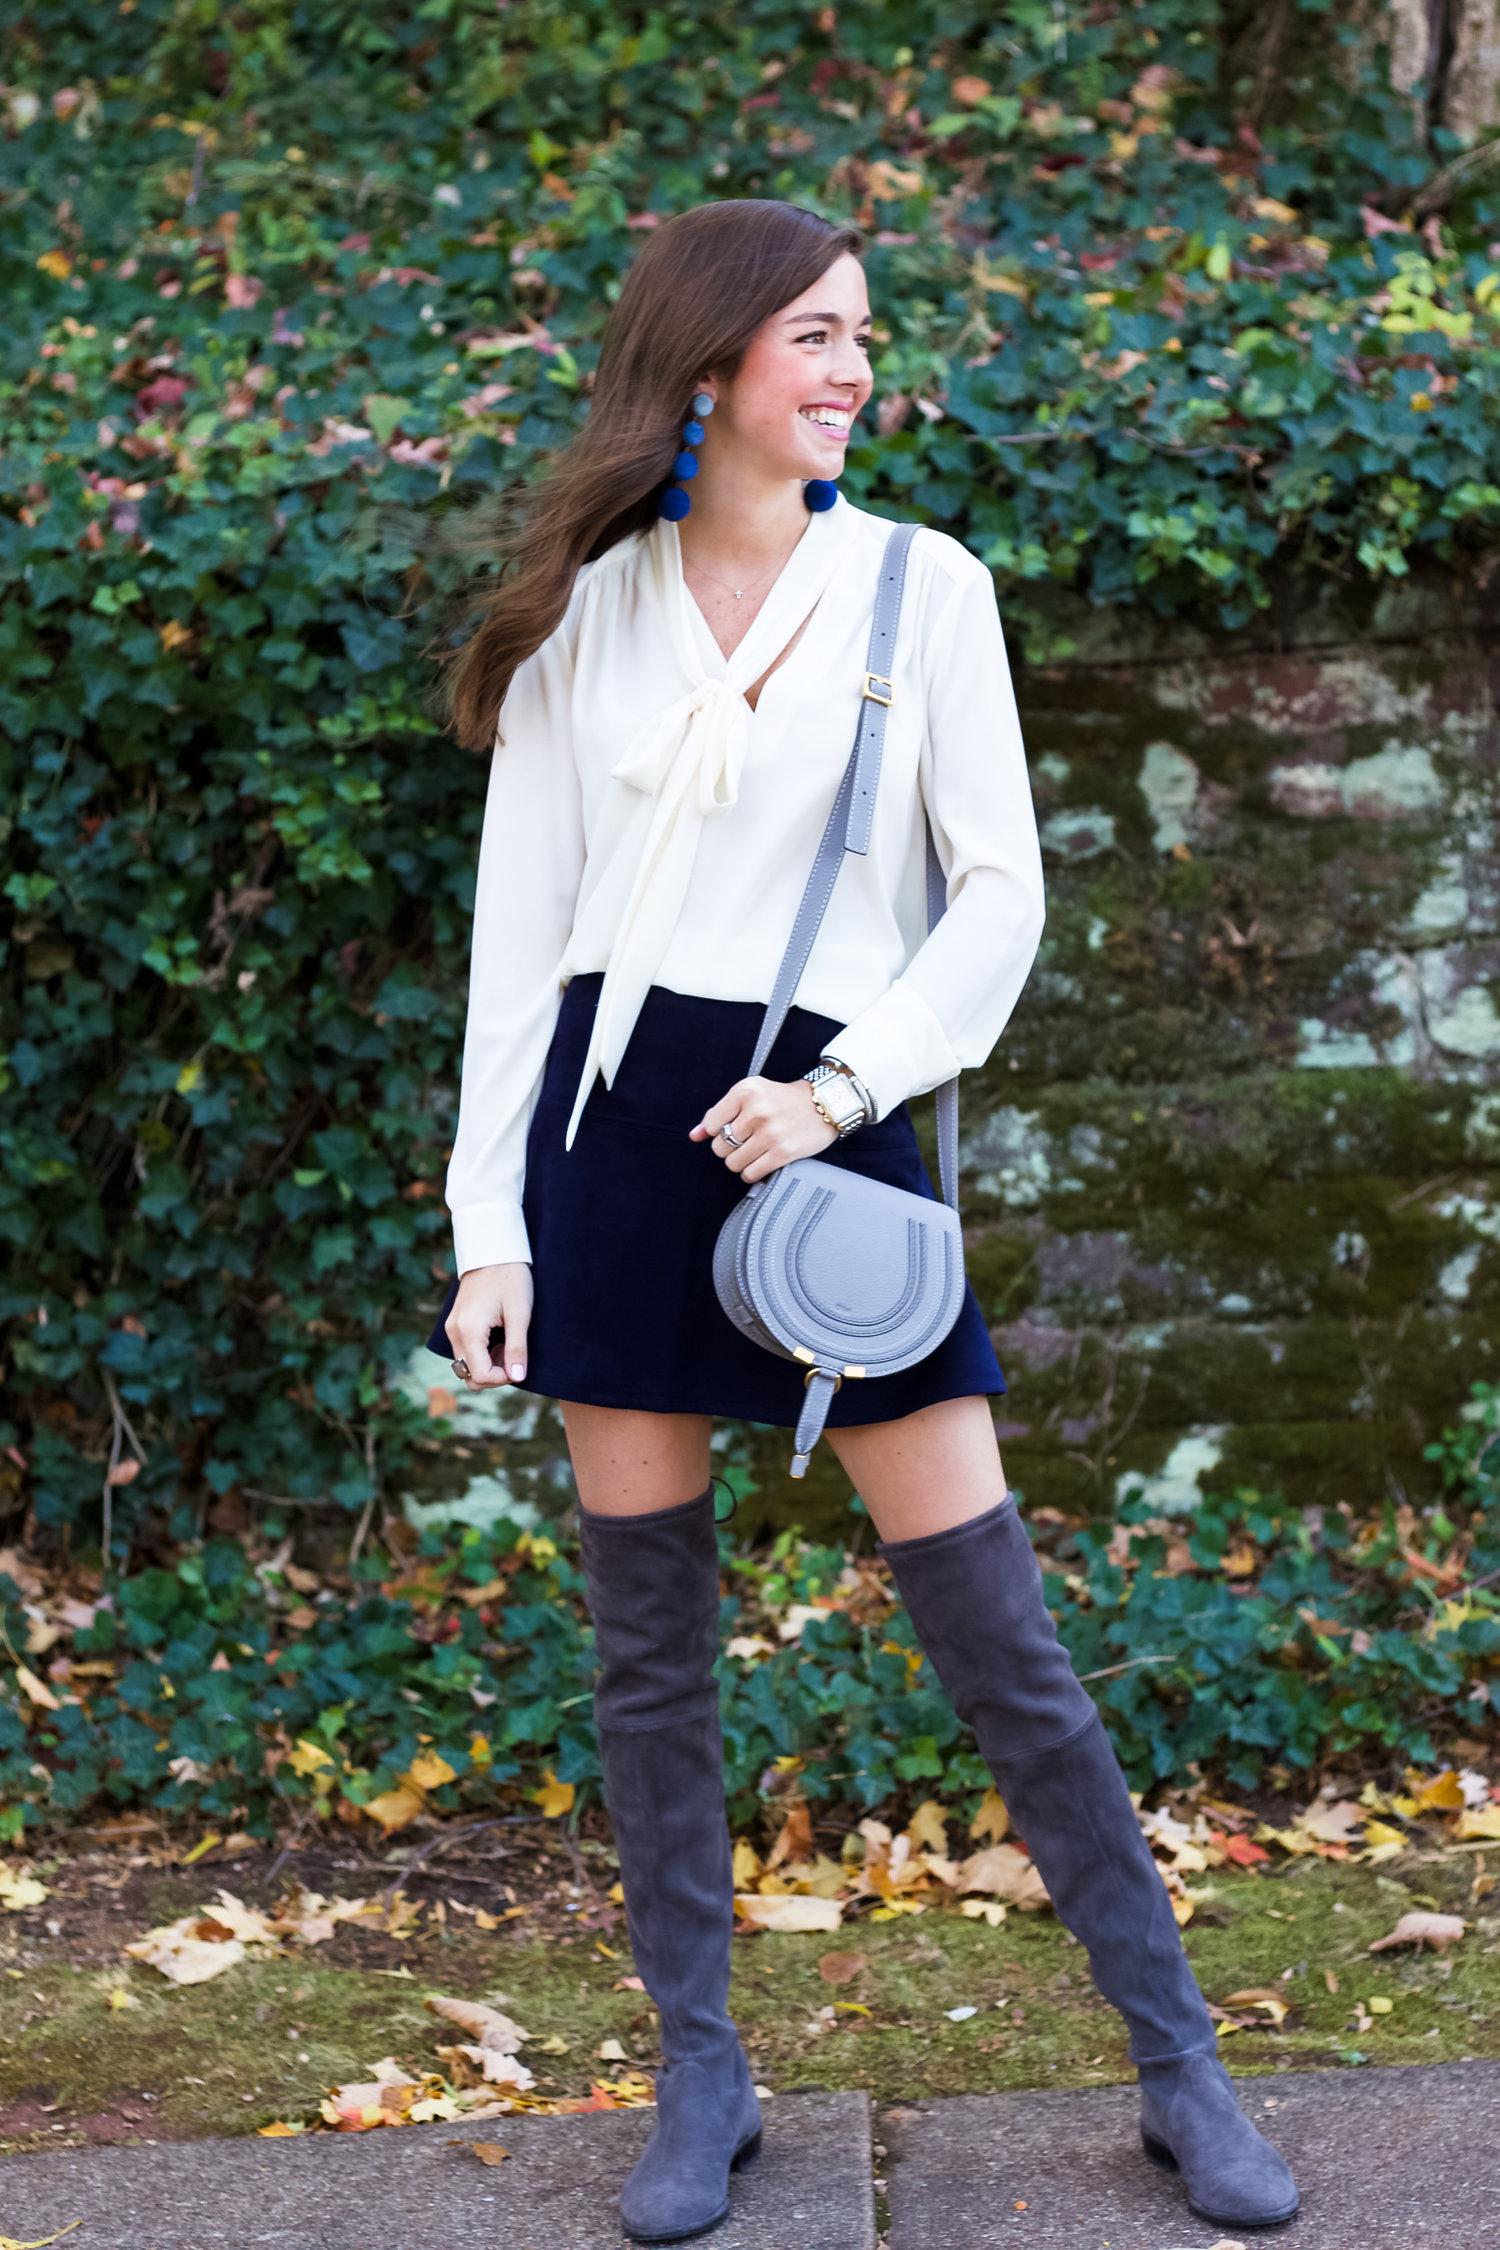 506f45fb106 fashion+blogger+lcb+style+suede+skirt+knee+boots +stuart+weitzman+chloe+marci+(2+of+19).jpg format 1500w